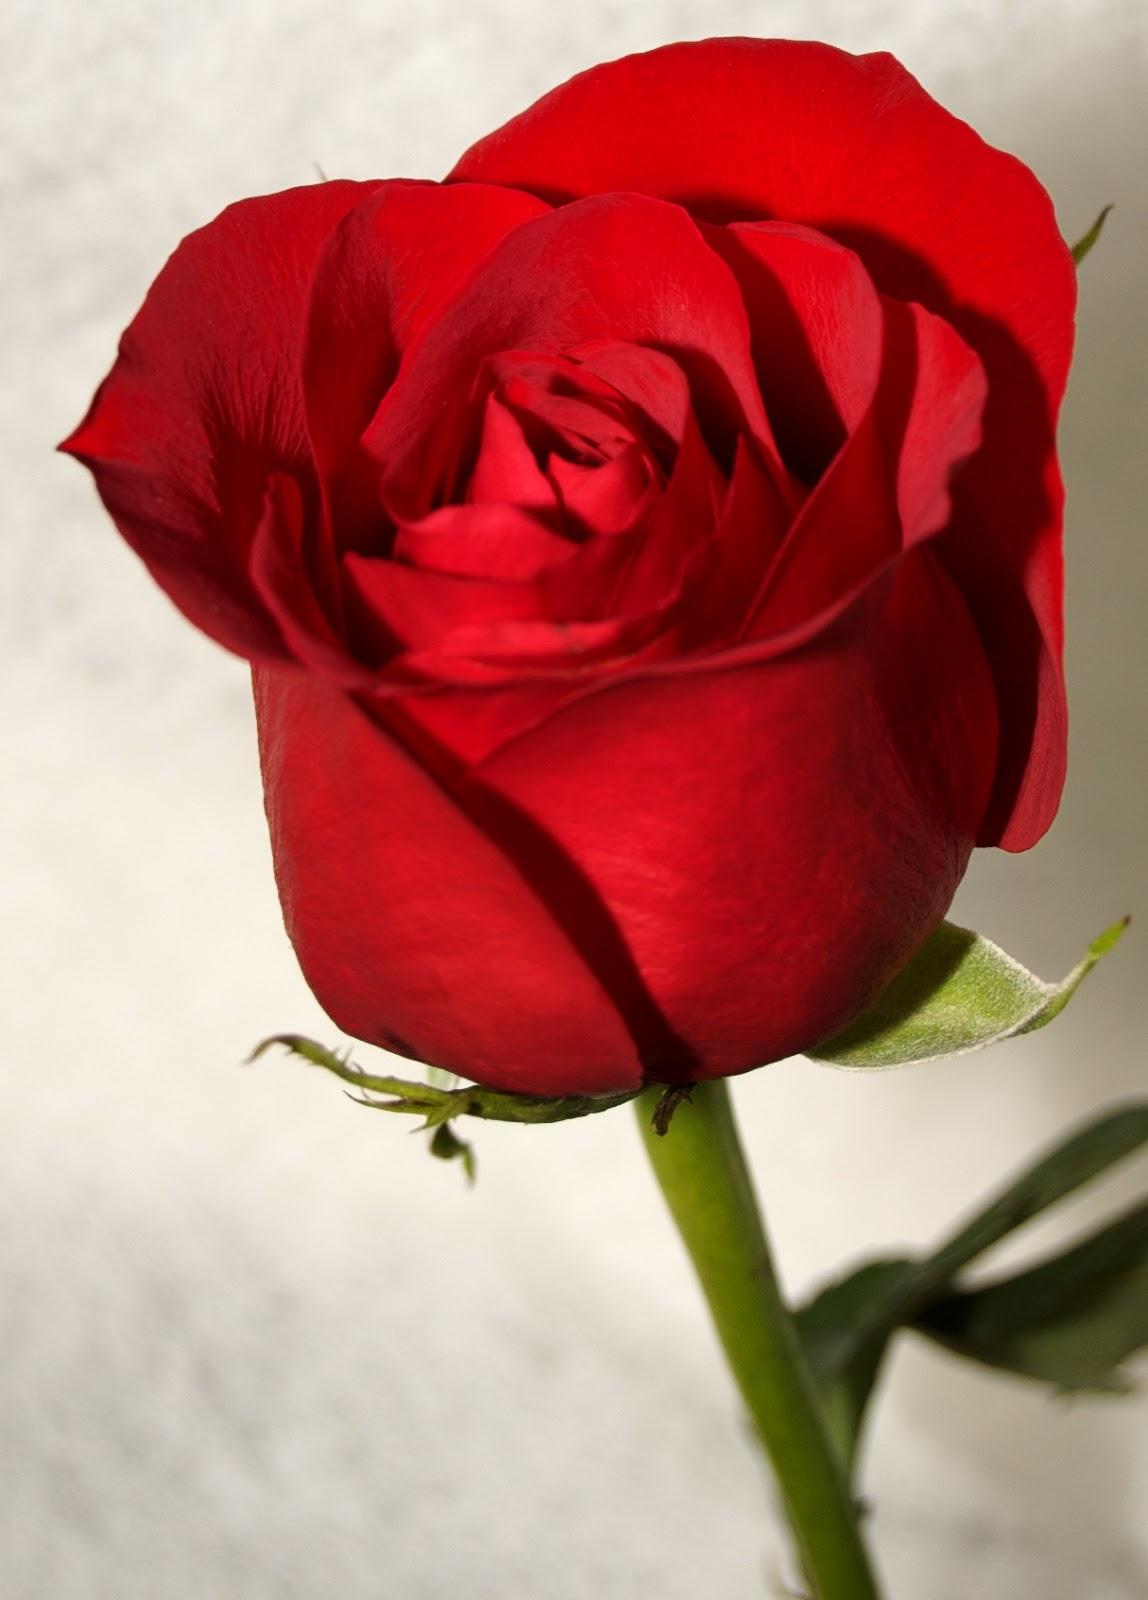 Rose Flowers Free Download